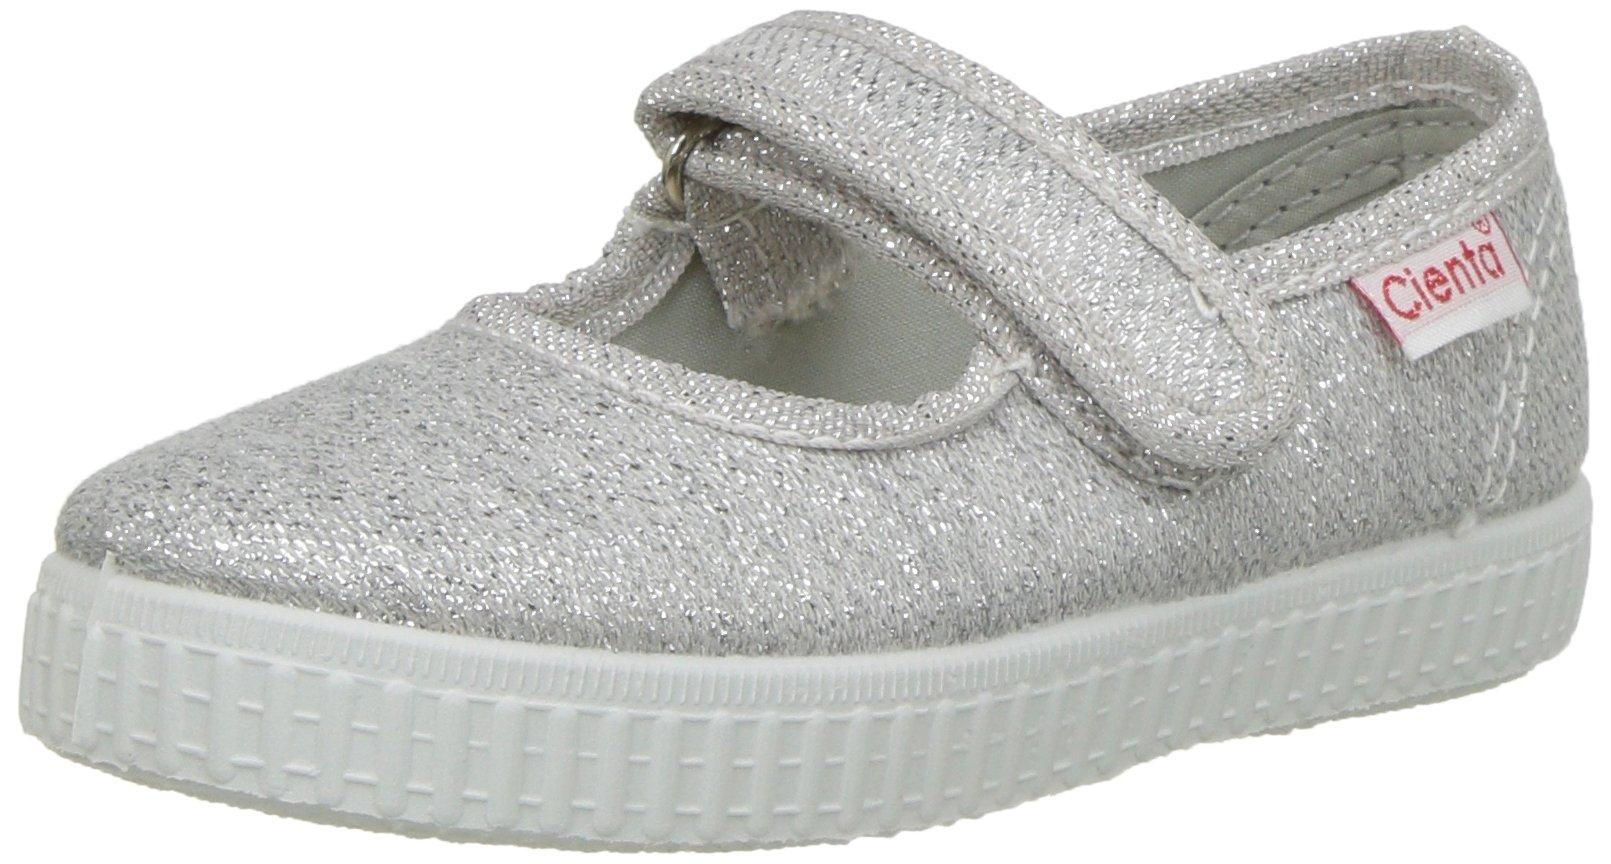 Cienta 56013 Glitter Mary Jane Fashion Sneaker,Silver,30 EU (12 M US Toddler)